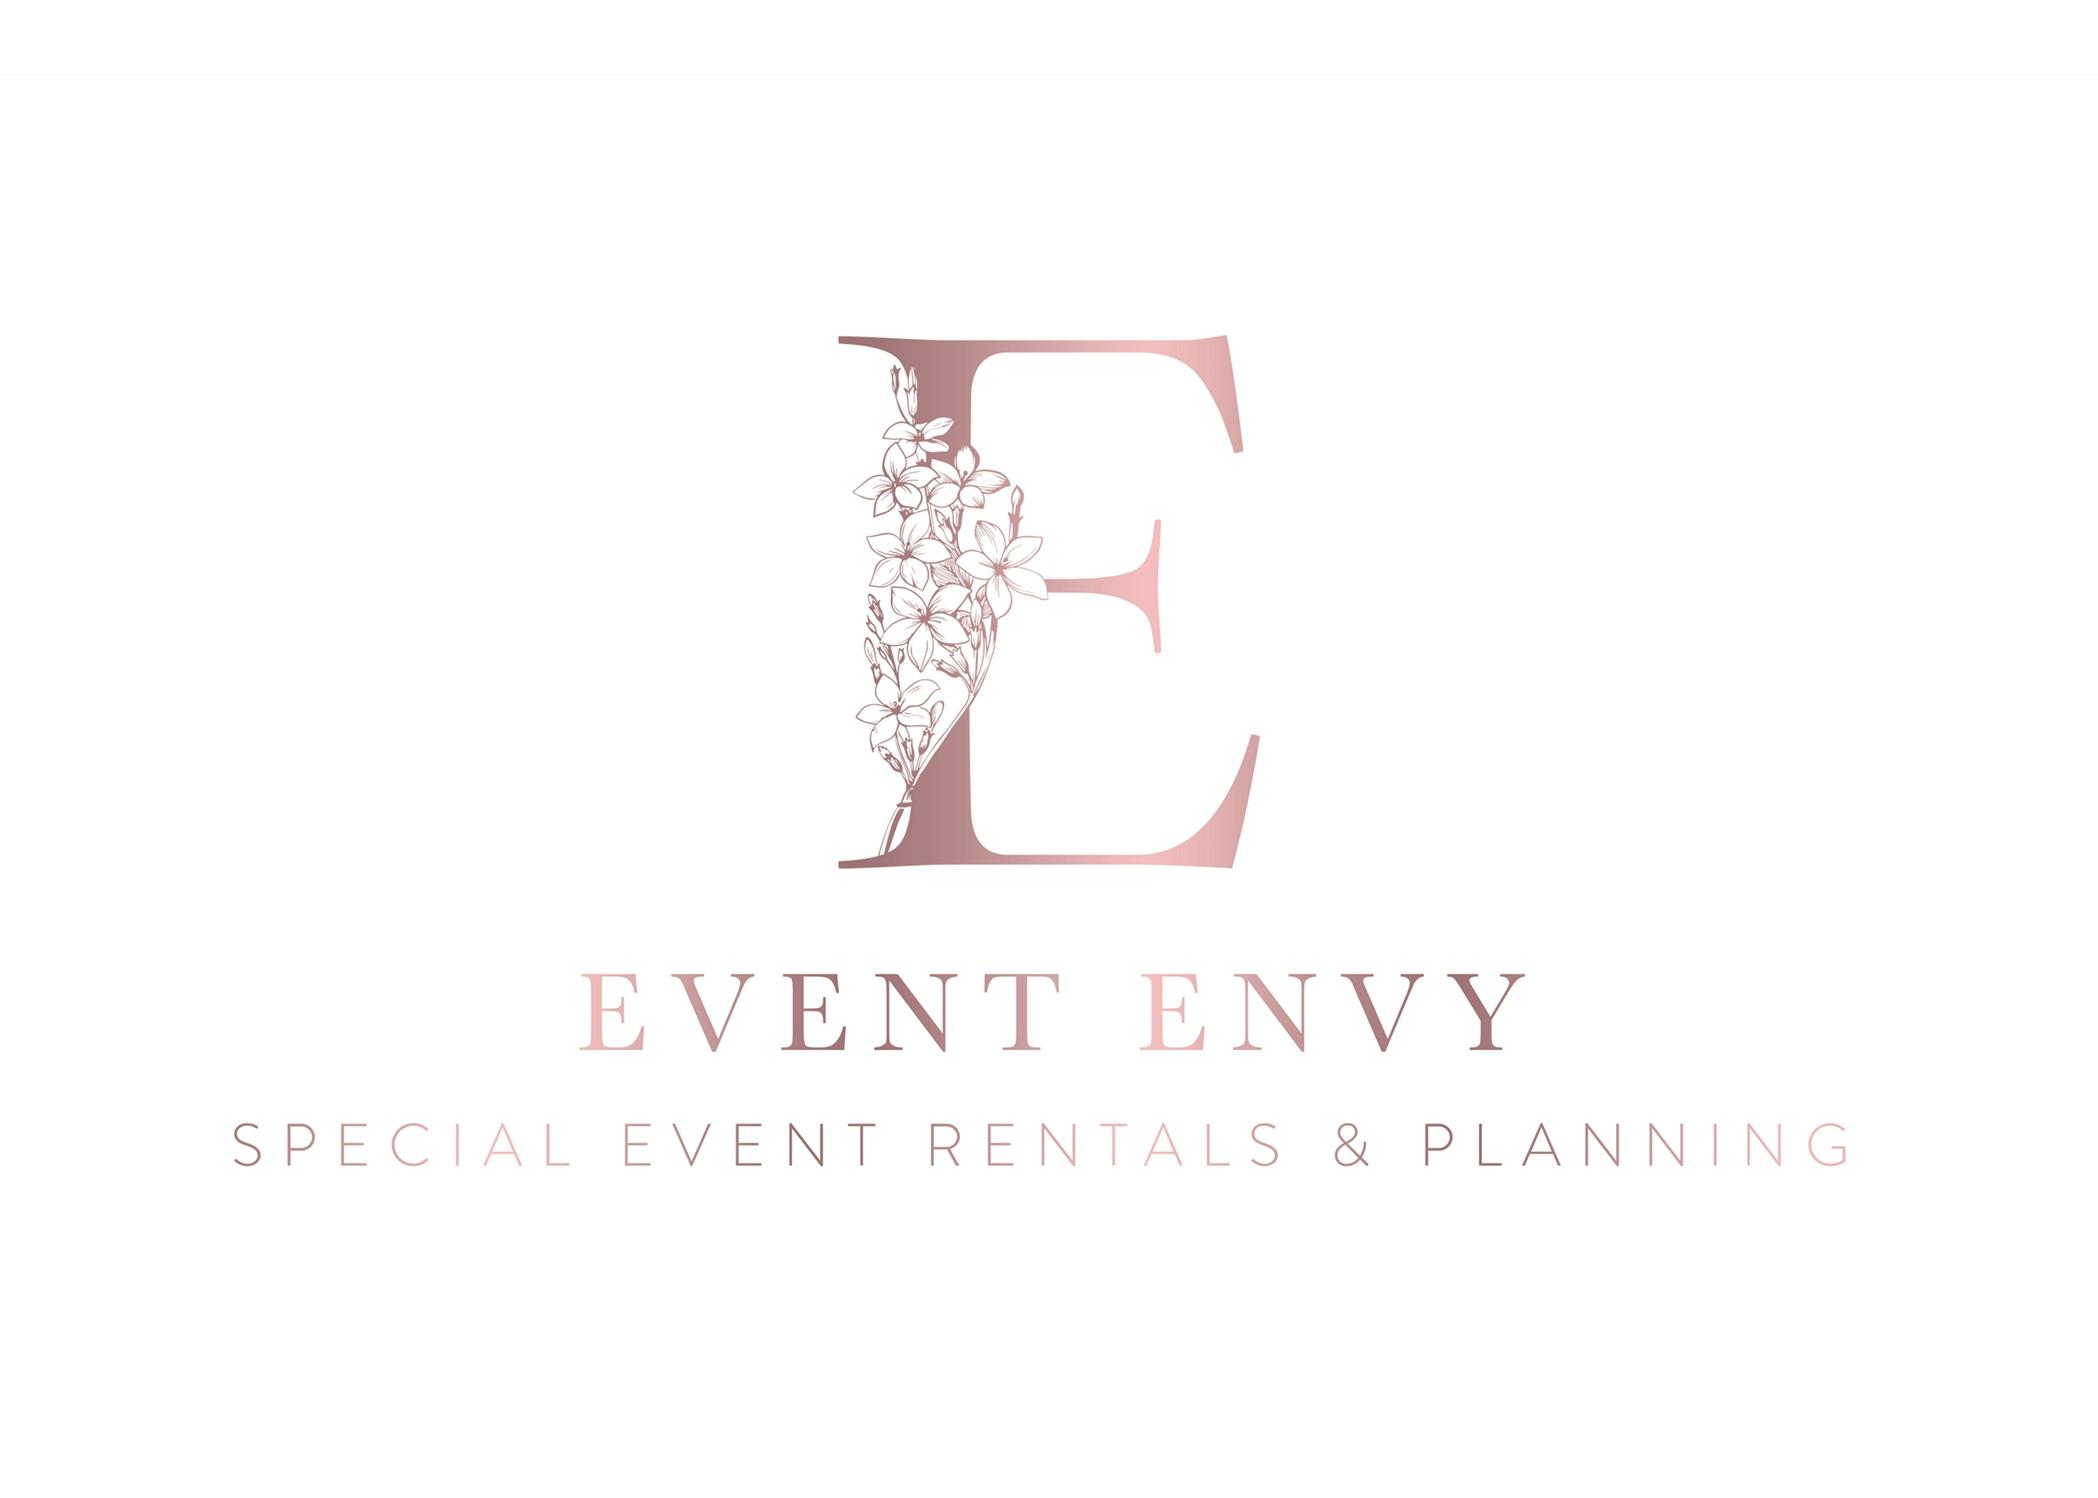 Event Envy